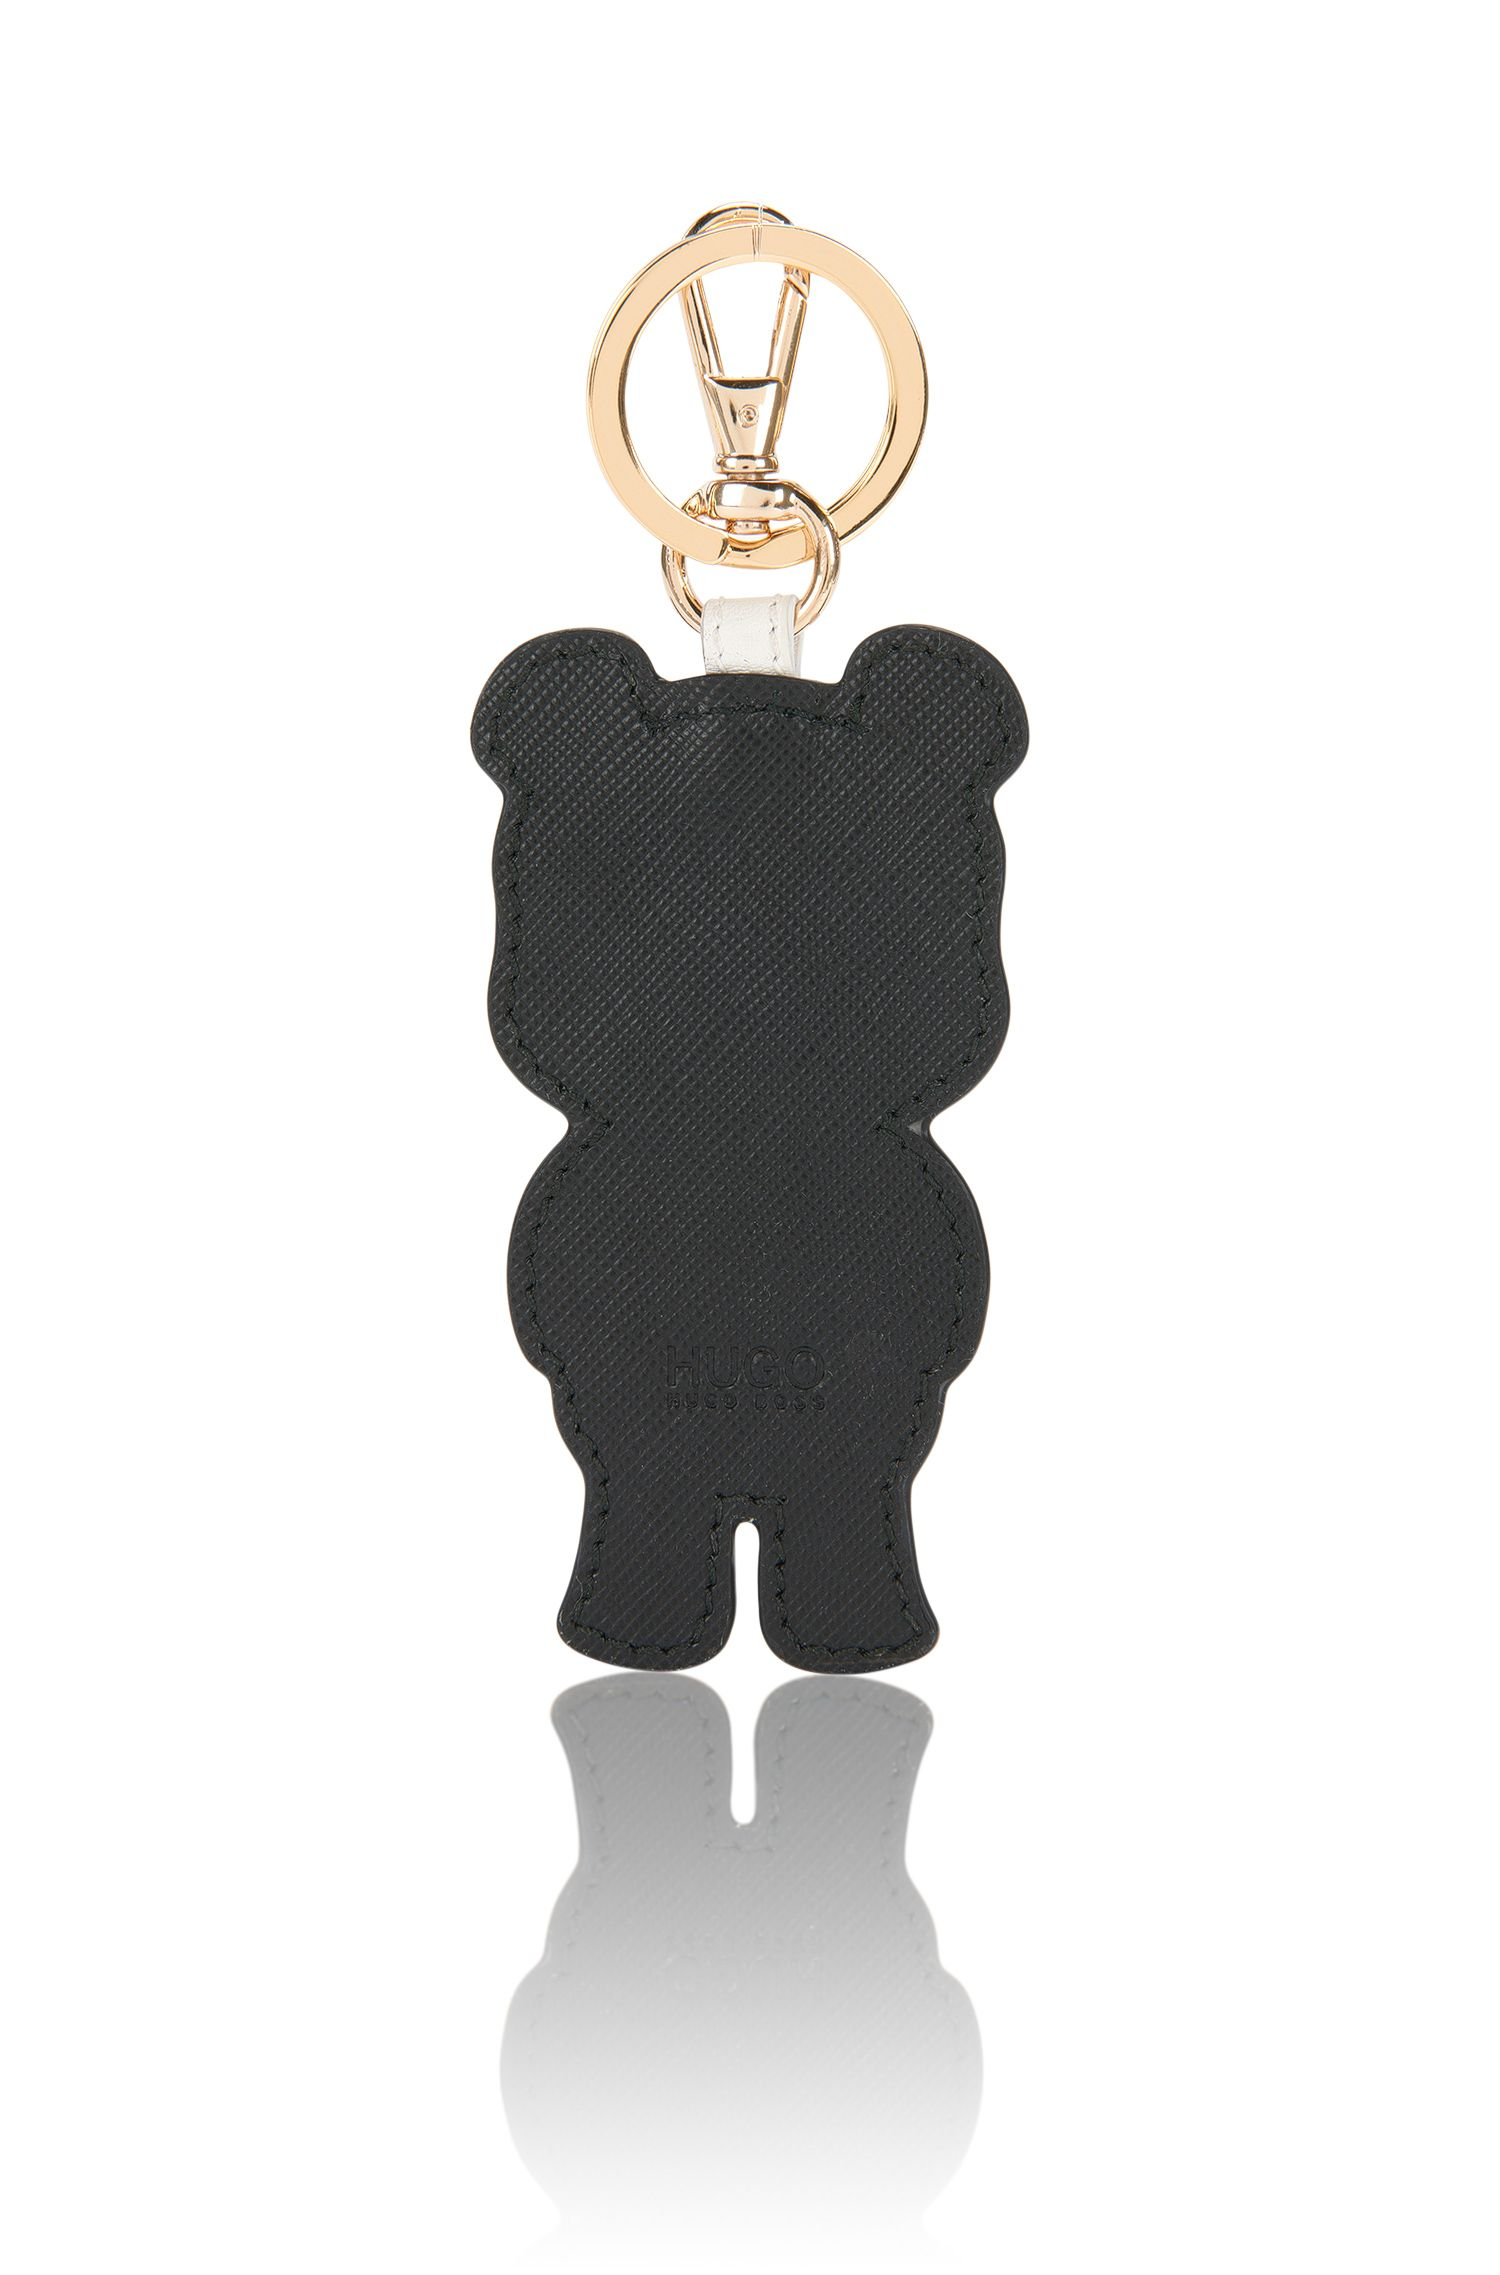 Schlüsselanhänger aus Leder mit Pandabär-Motiv: 'Kiki'